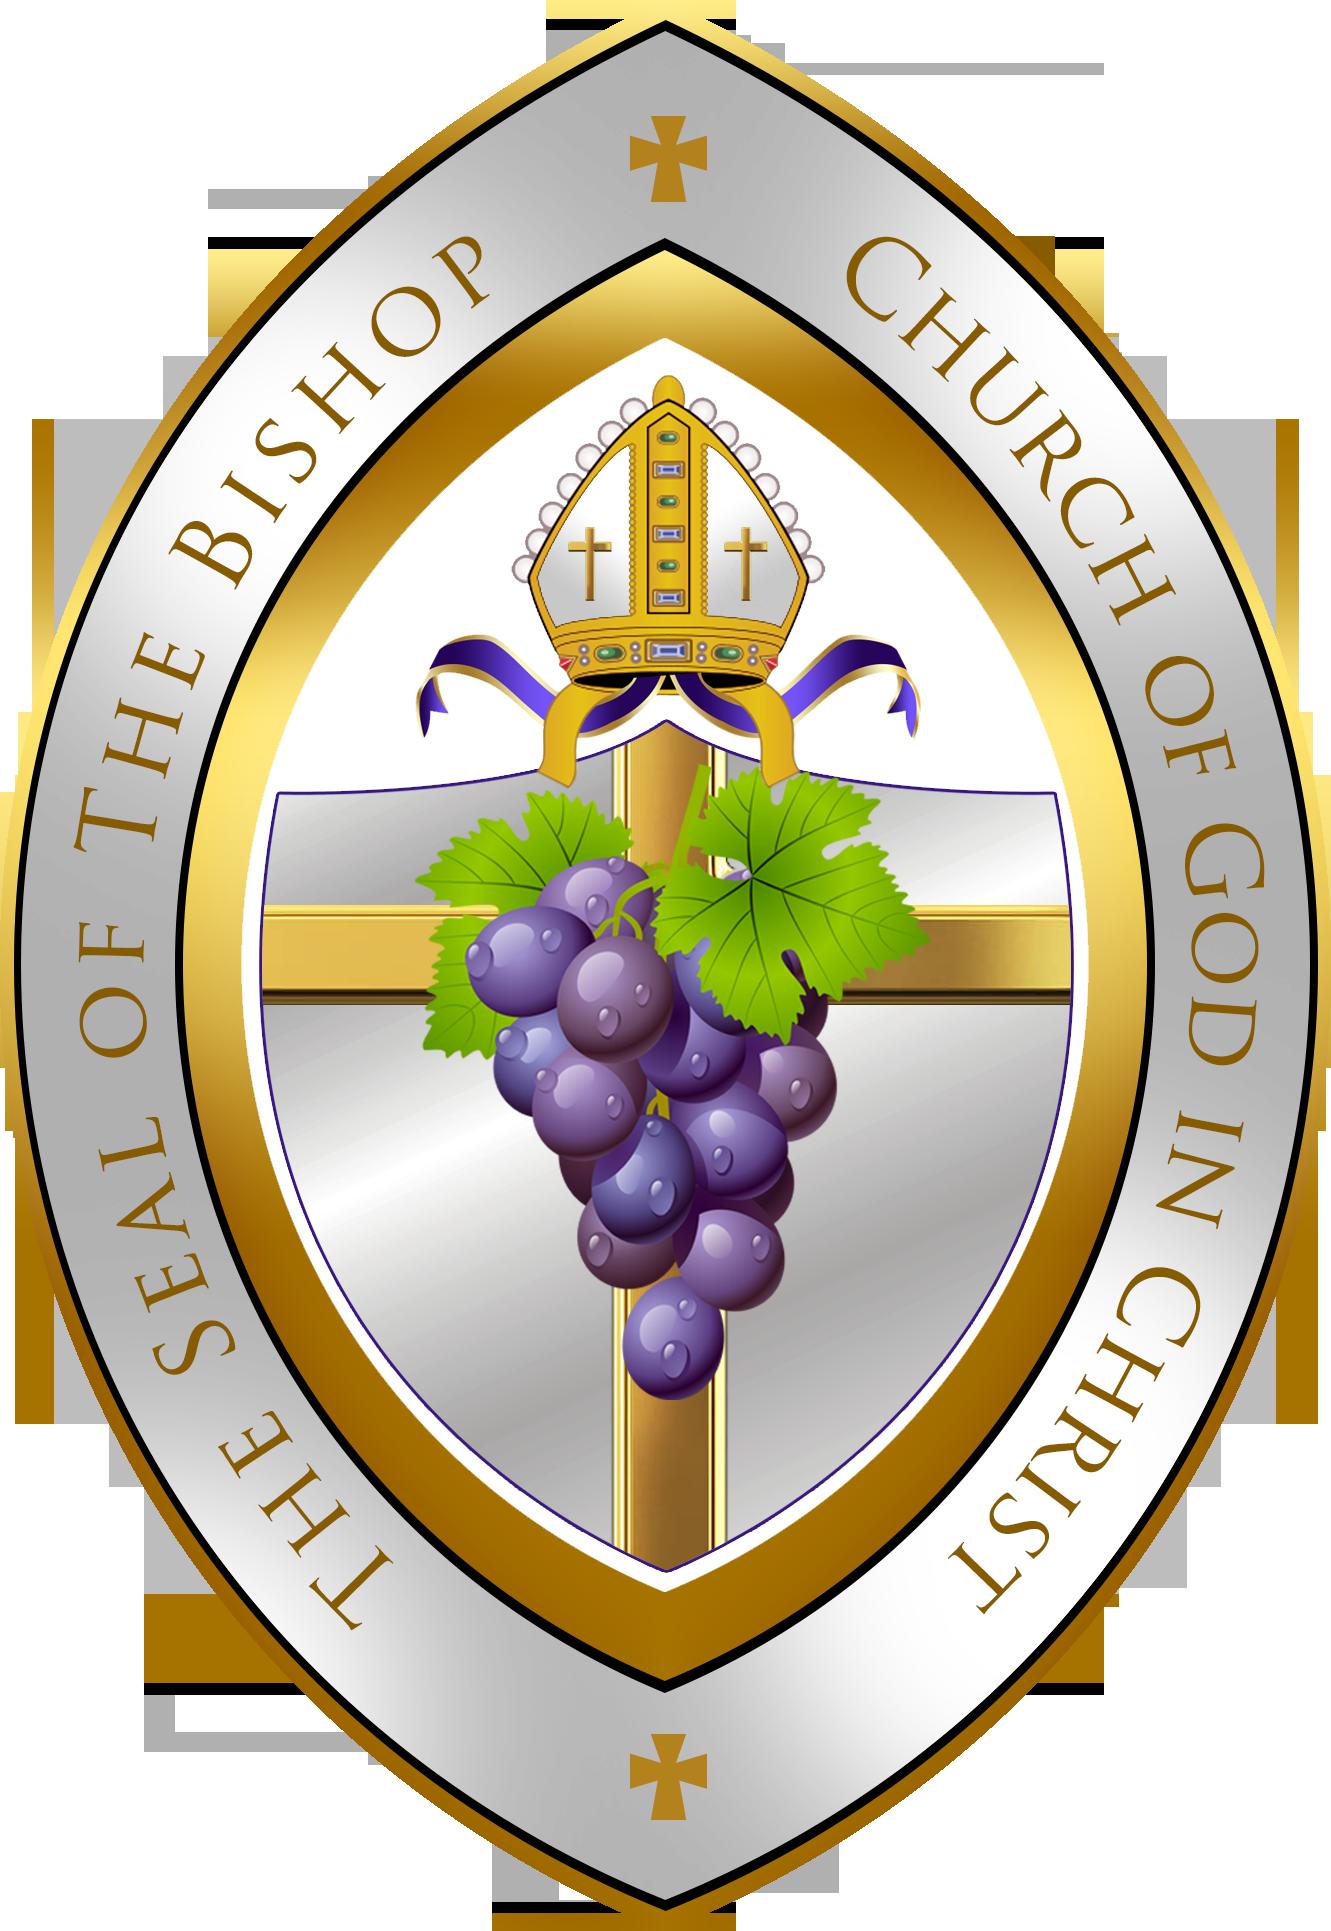 Bishop Charles Blake | Making Headline News